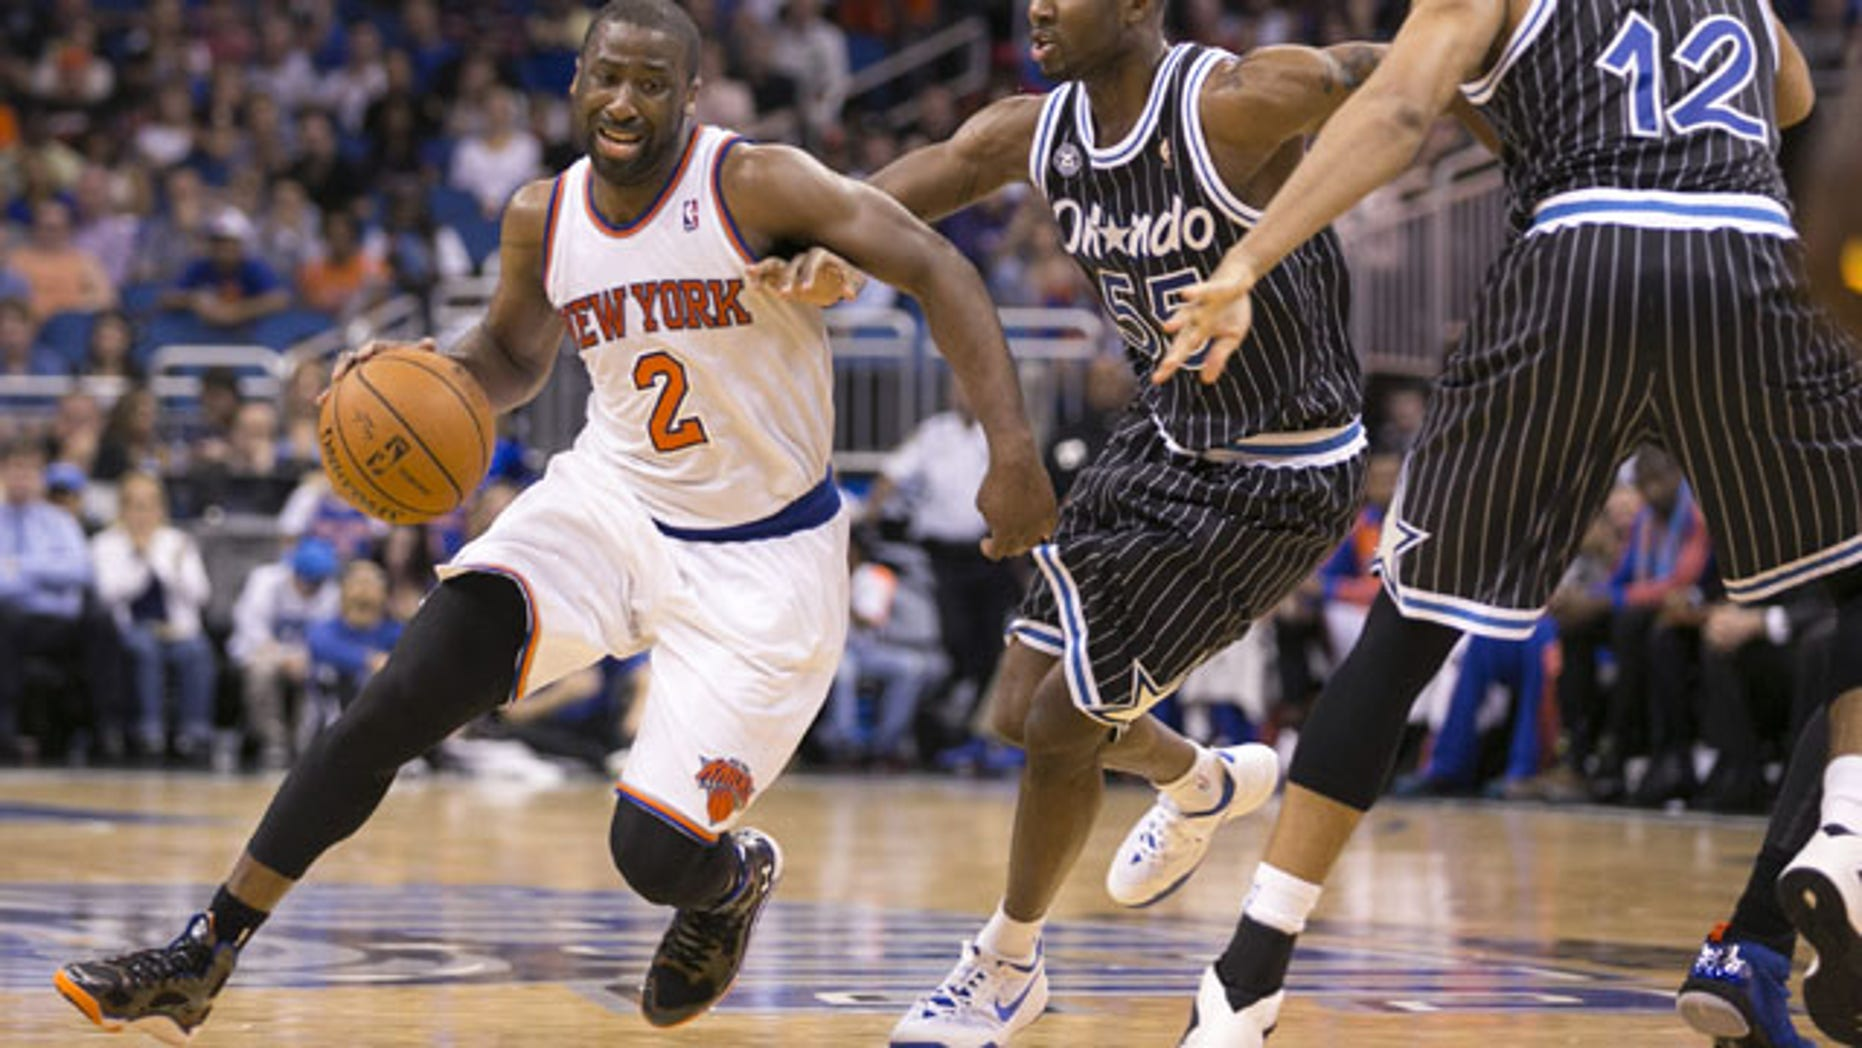 February 21, 2014: New York Knicks' Raymond Felton (2) dribbles around Orlando Magic's E'Twaun Moore (55) and Tobias Harris (12) during an NBA basketball game in Orlando, Fla. The Magic won 129-121 in two overtimes. (AP Photos/Willie J. Allen Jr.)